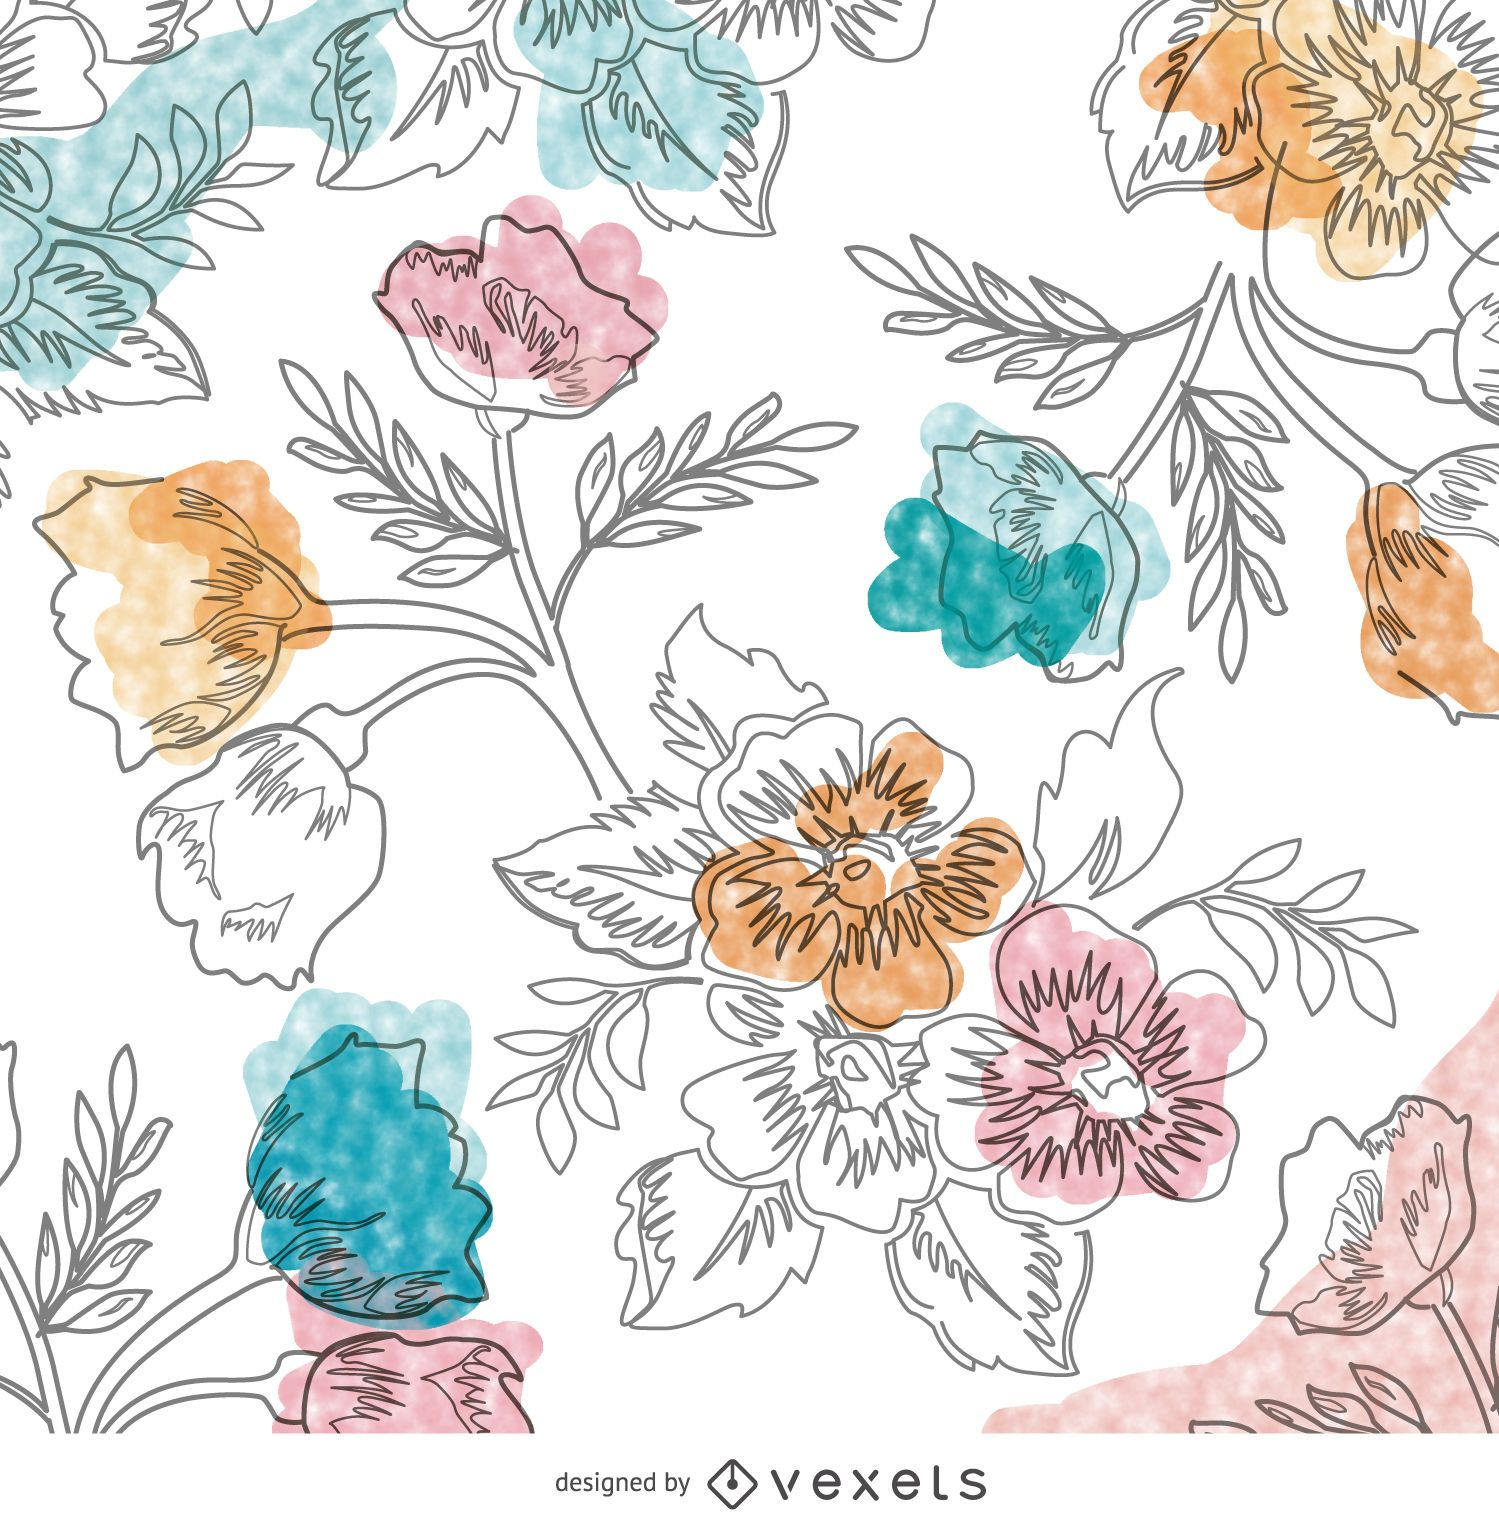 Papel pintado floral acuarela dibujado a mano